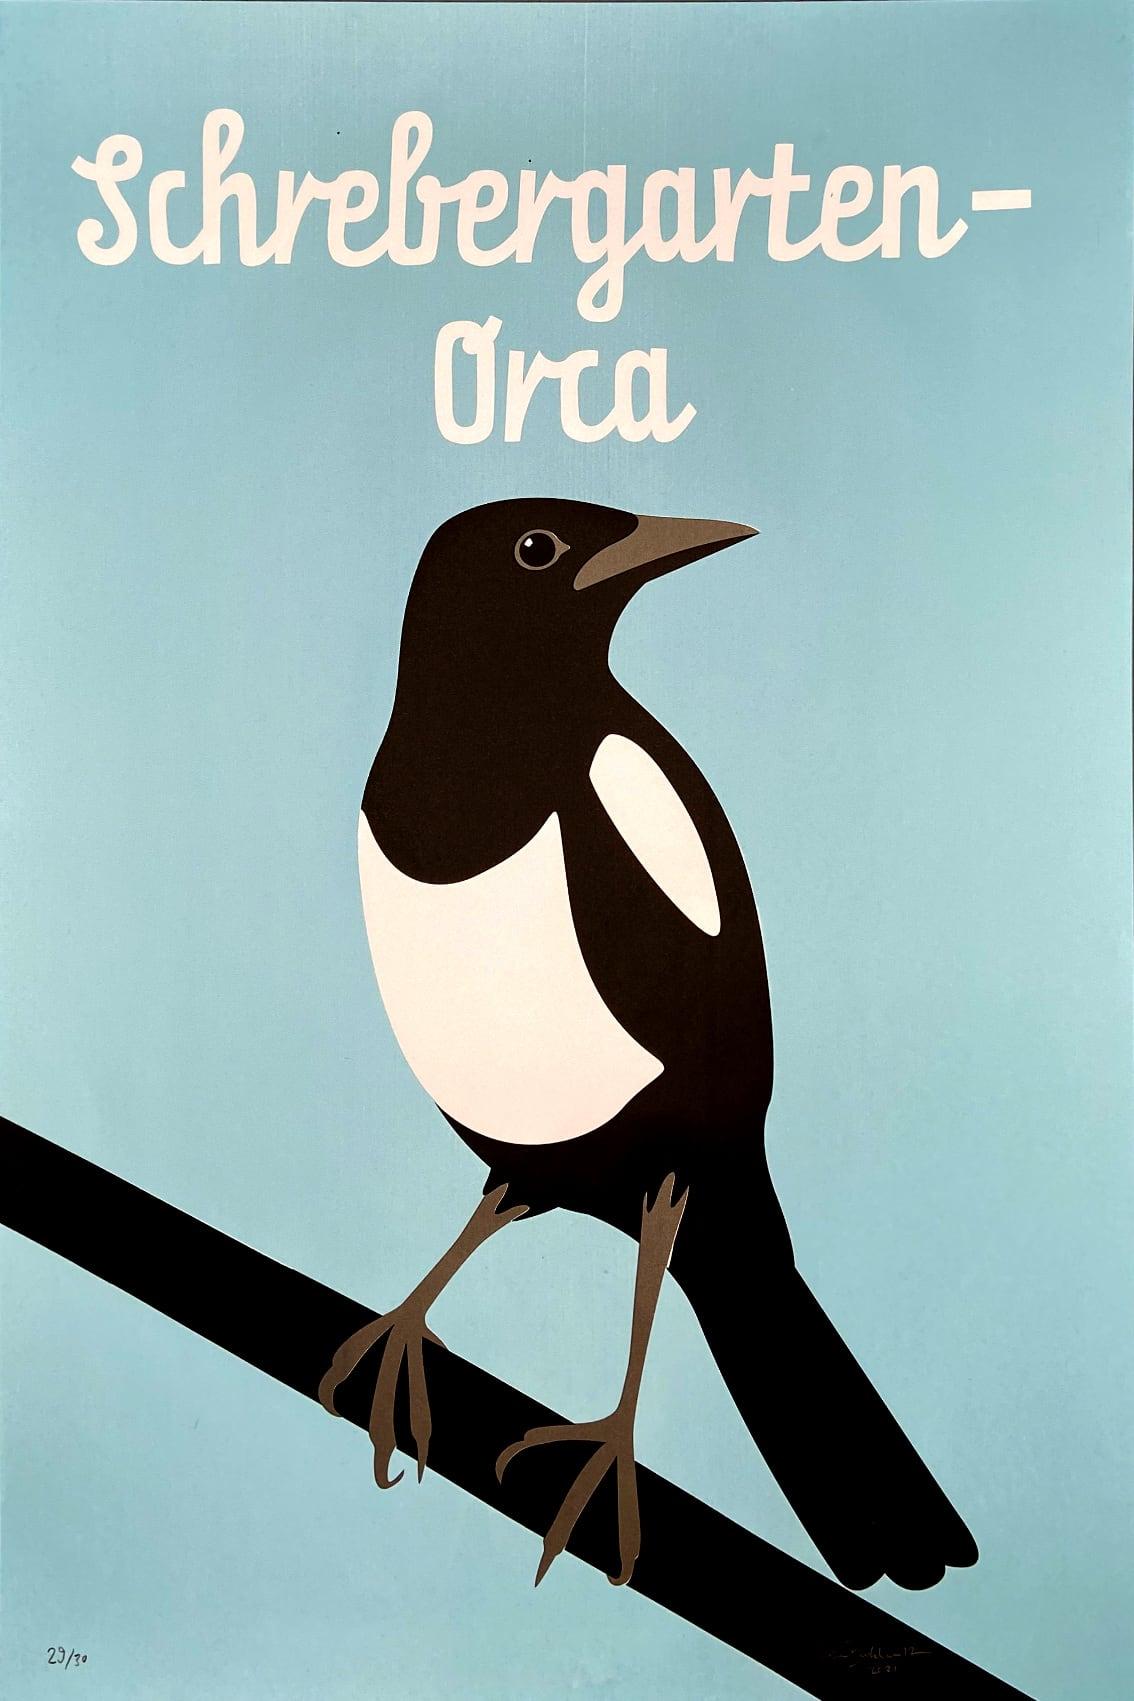 Schrebergarten-Orca